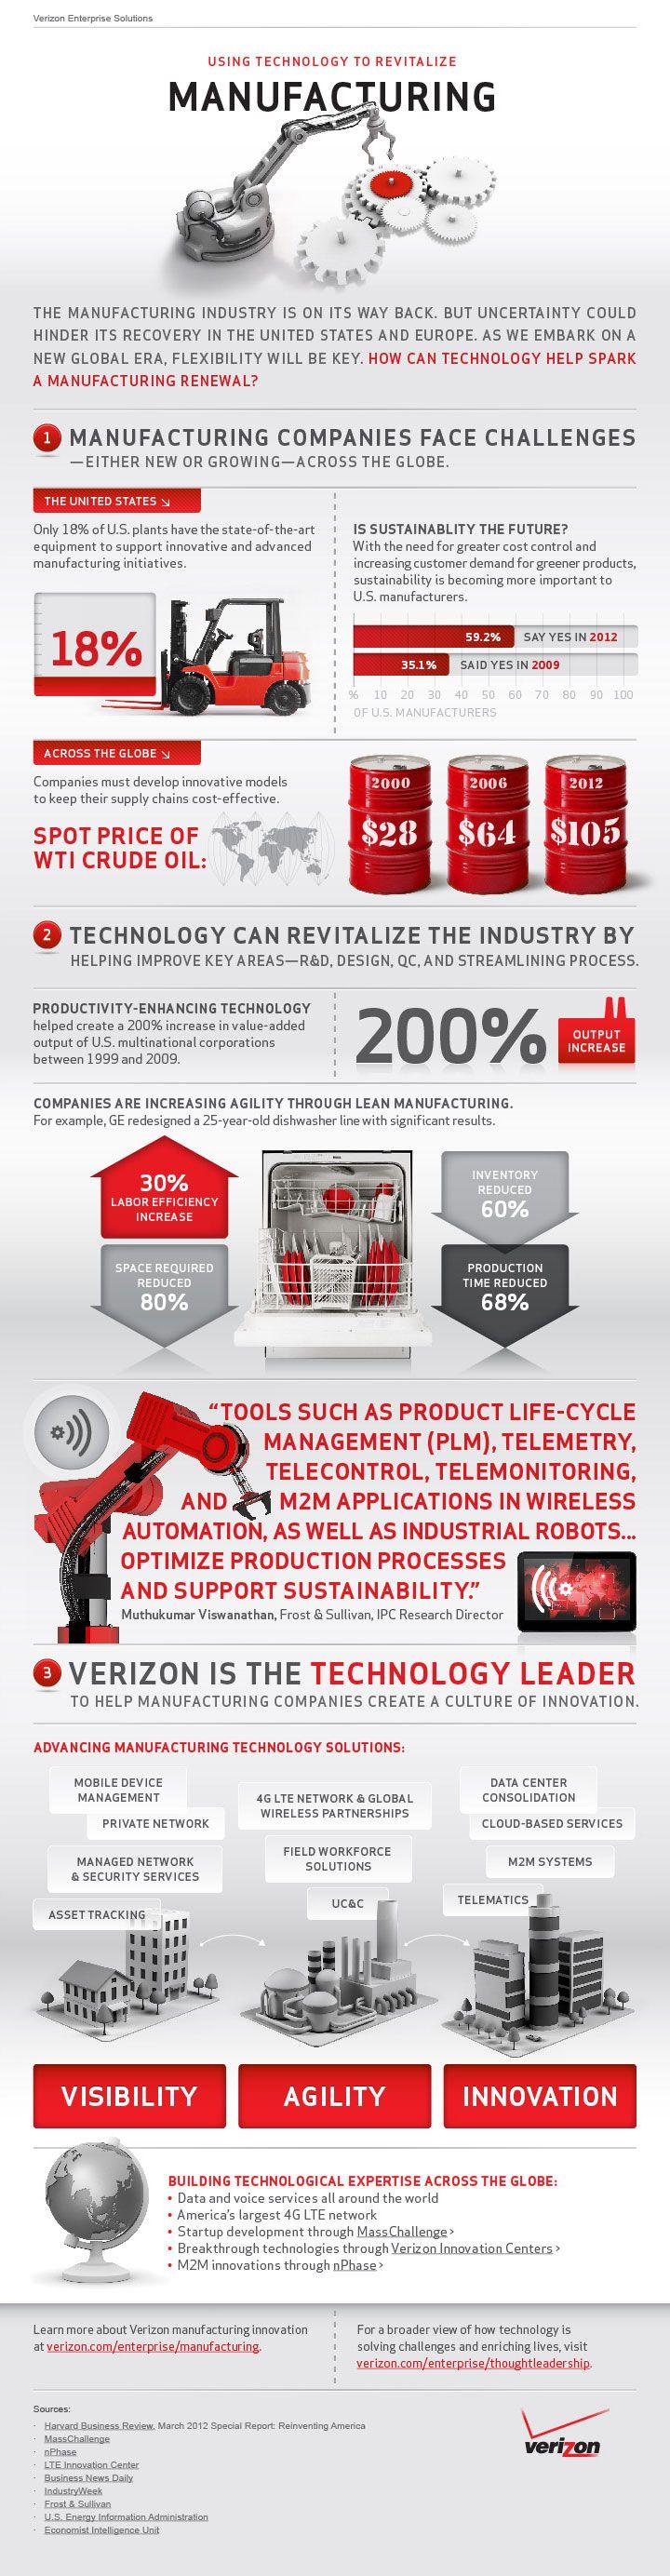 http://www.verizonenterprise.com/info/manufacturing/infographic-small.jpg